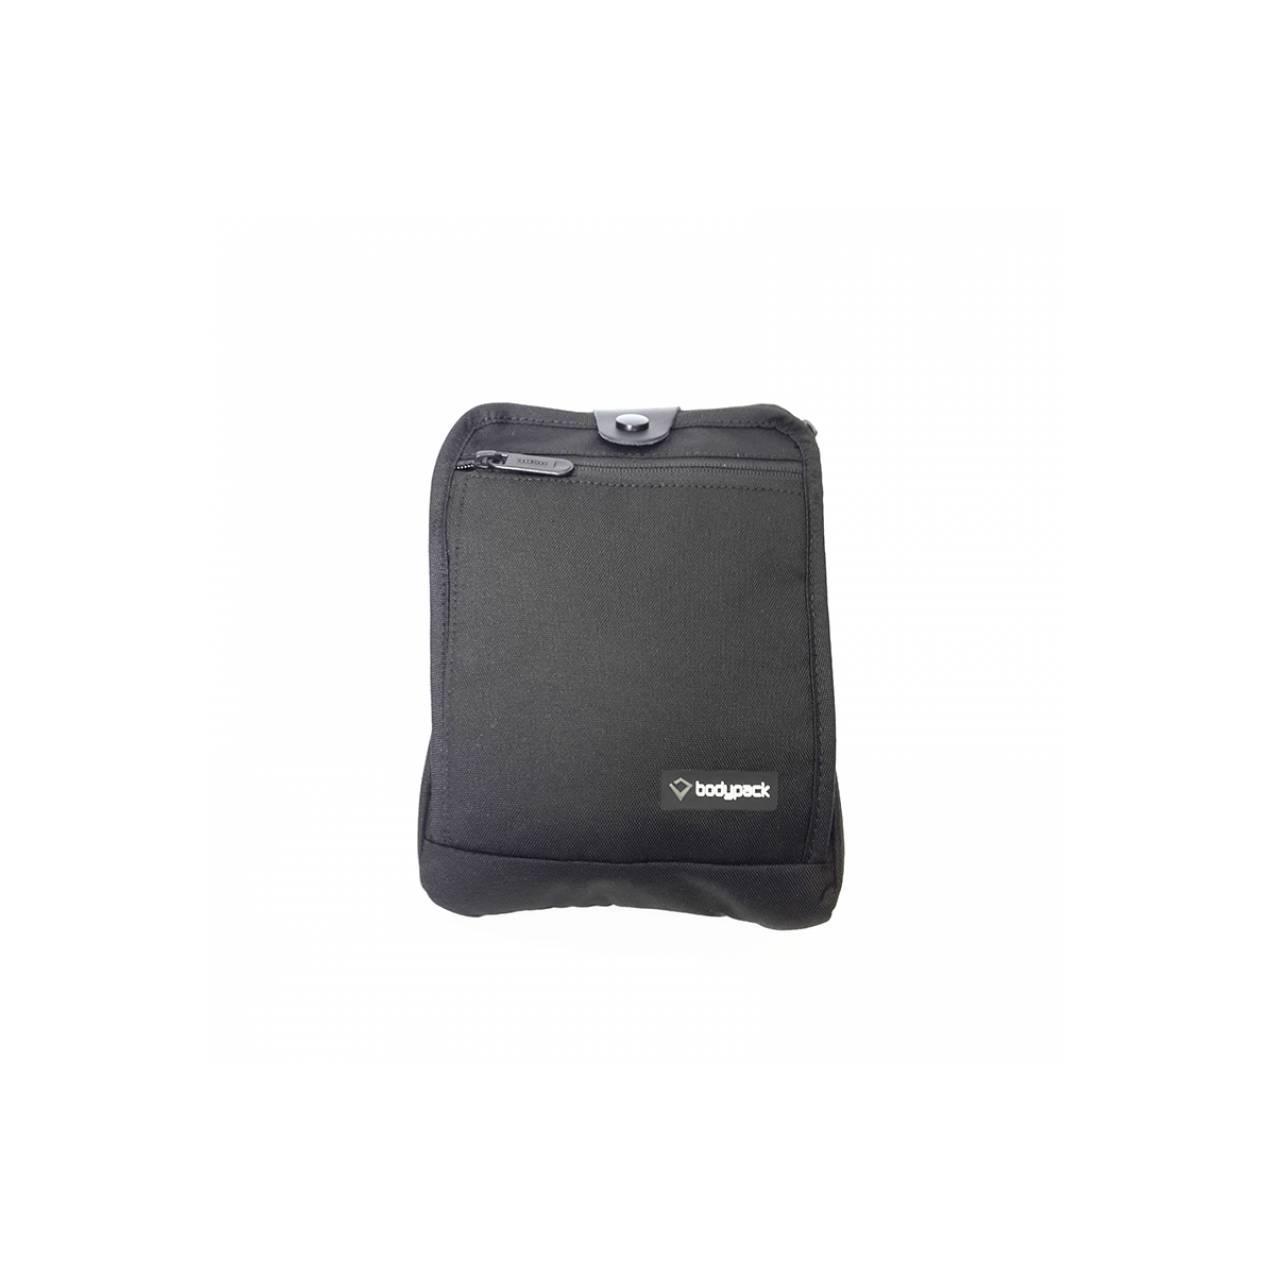 Remax Fashion Laptop Bodypack Shoulder Bags Tas Selempang Pria Men Bag Sling Merk 7099 Hitam Ransel Kantor Sekolah Backpack Travel